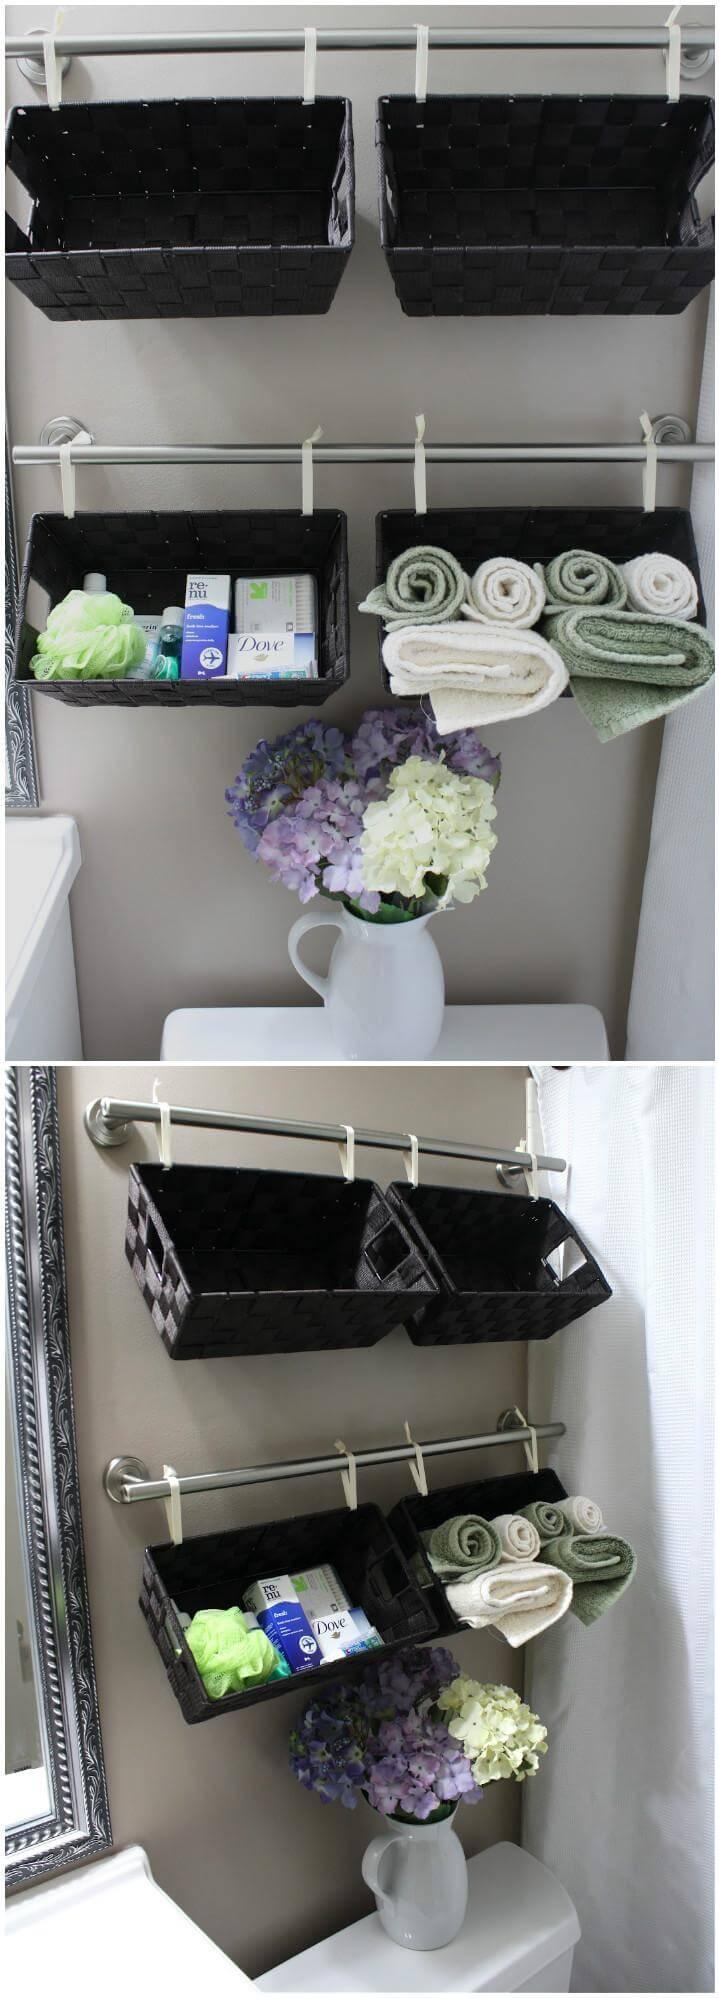 Self-installed bathroom wall hanging storage baskets